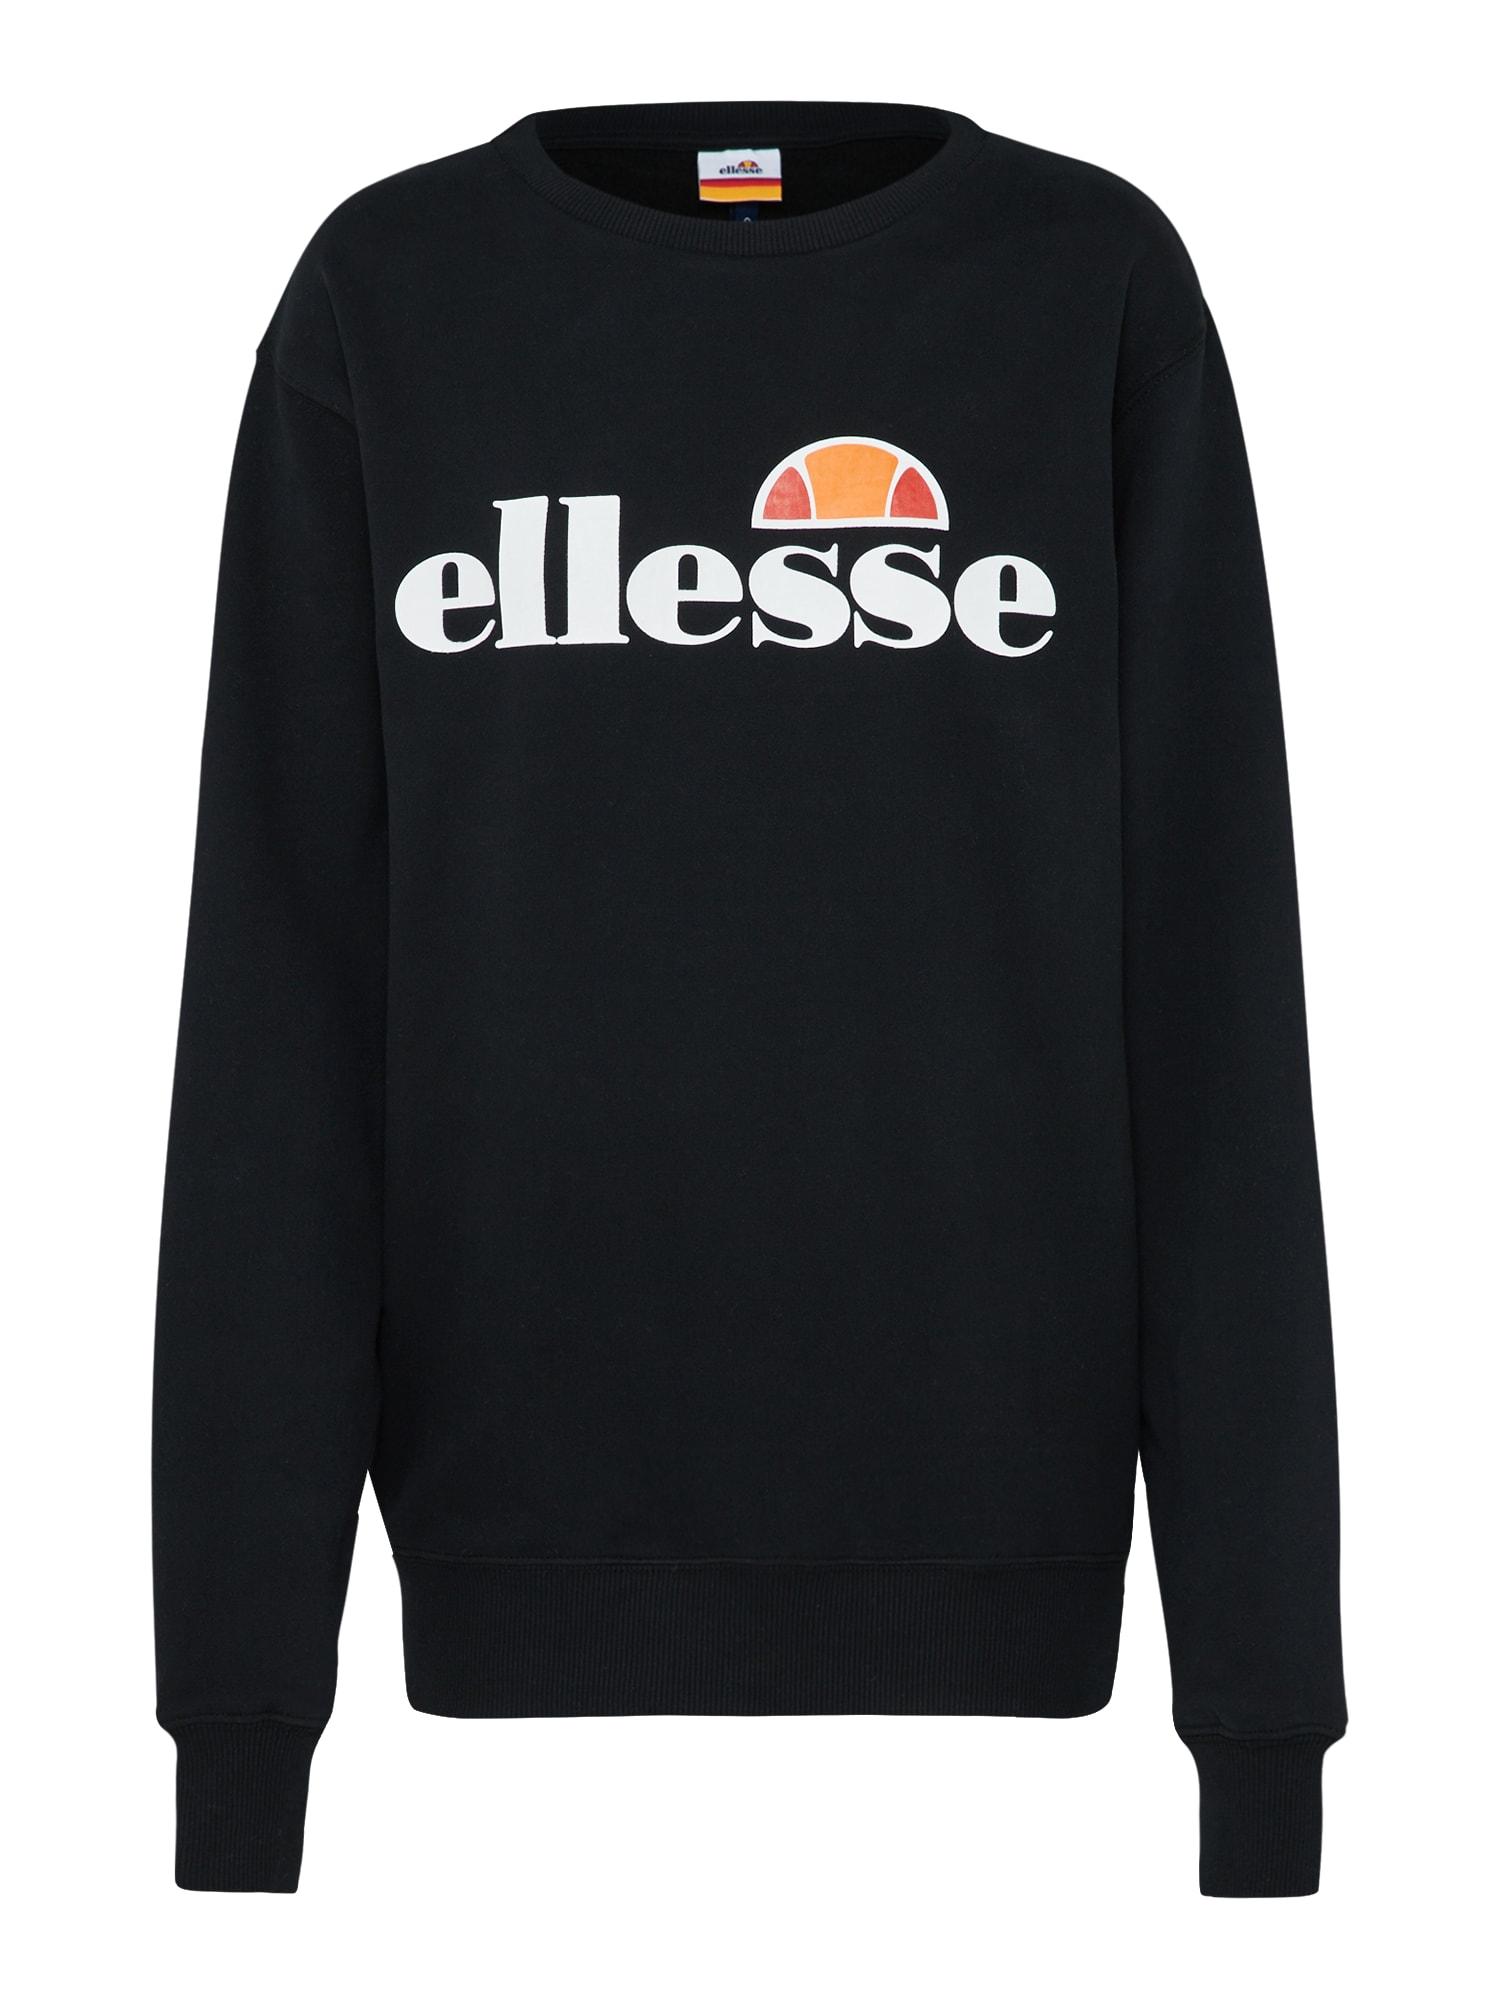 ELLESSE, Dames Sweatshirt 'Agata', zwart